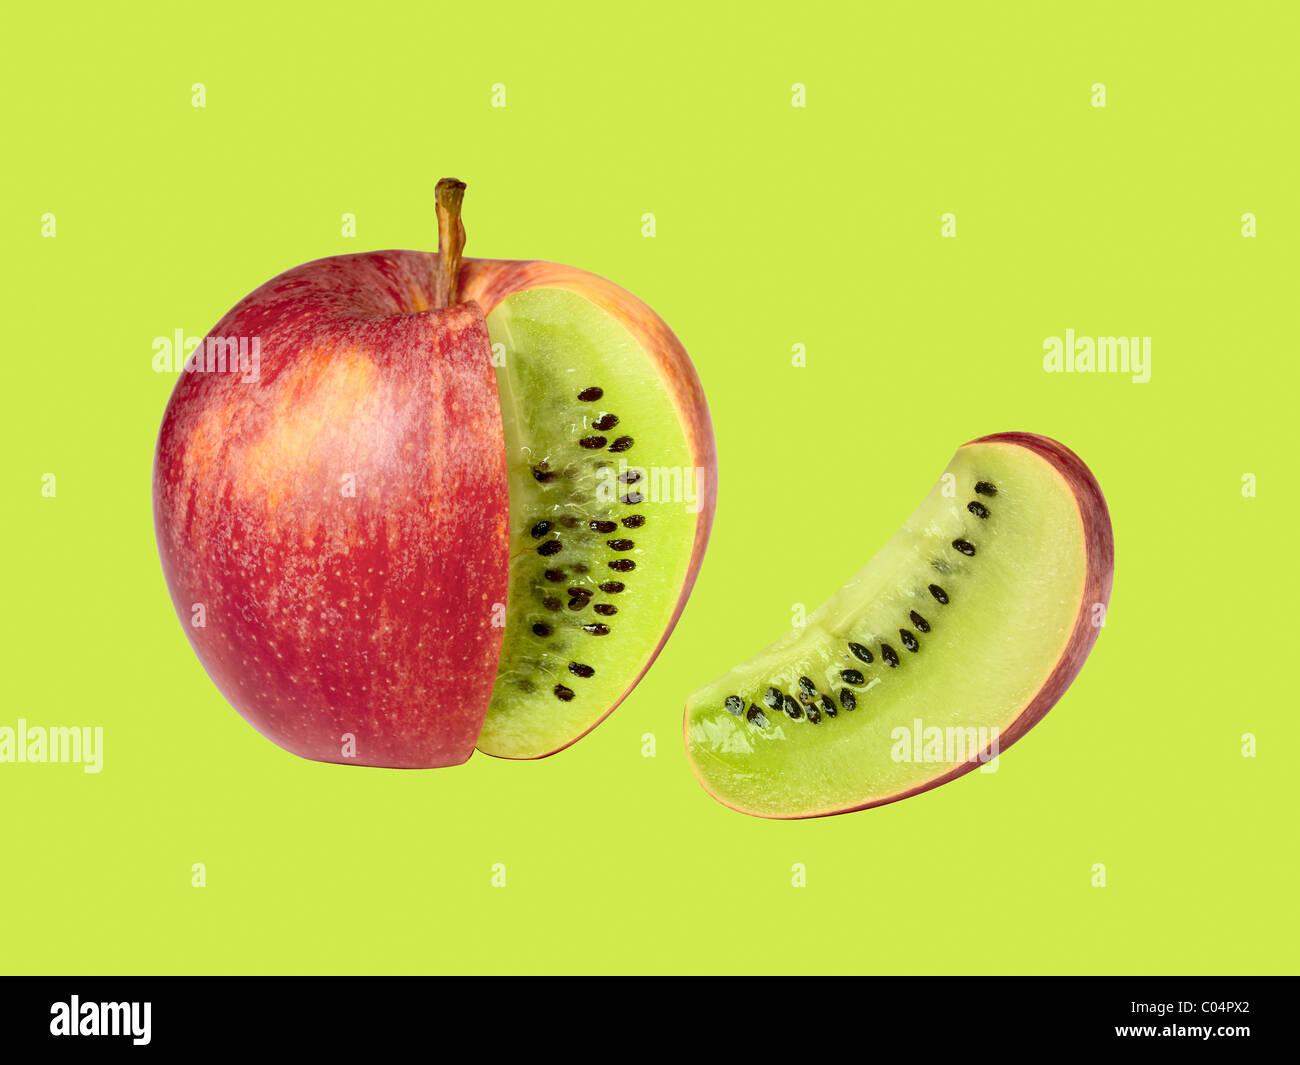 Apple transgénicos kiwi aislado sobre fondo verde Imagen De Stock